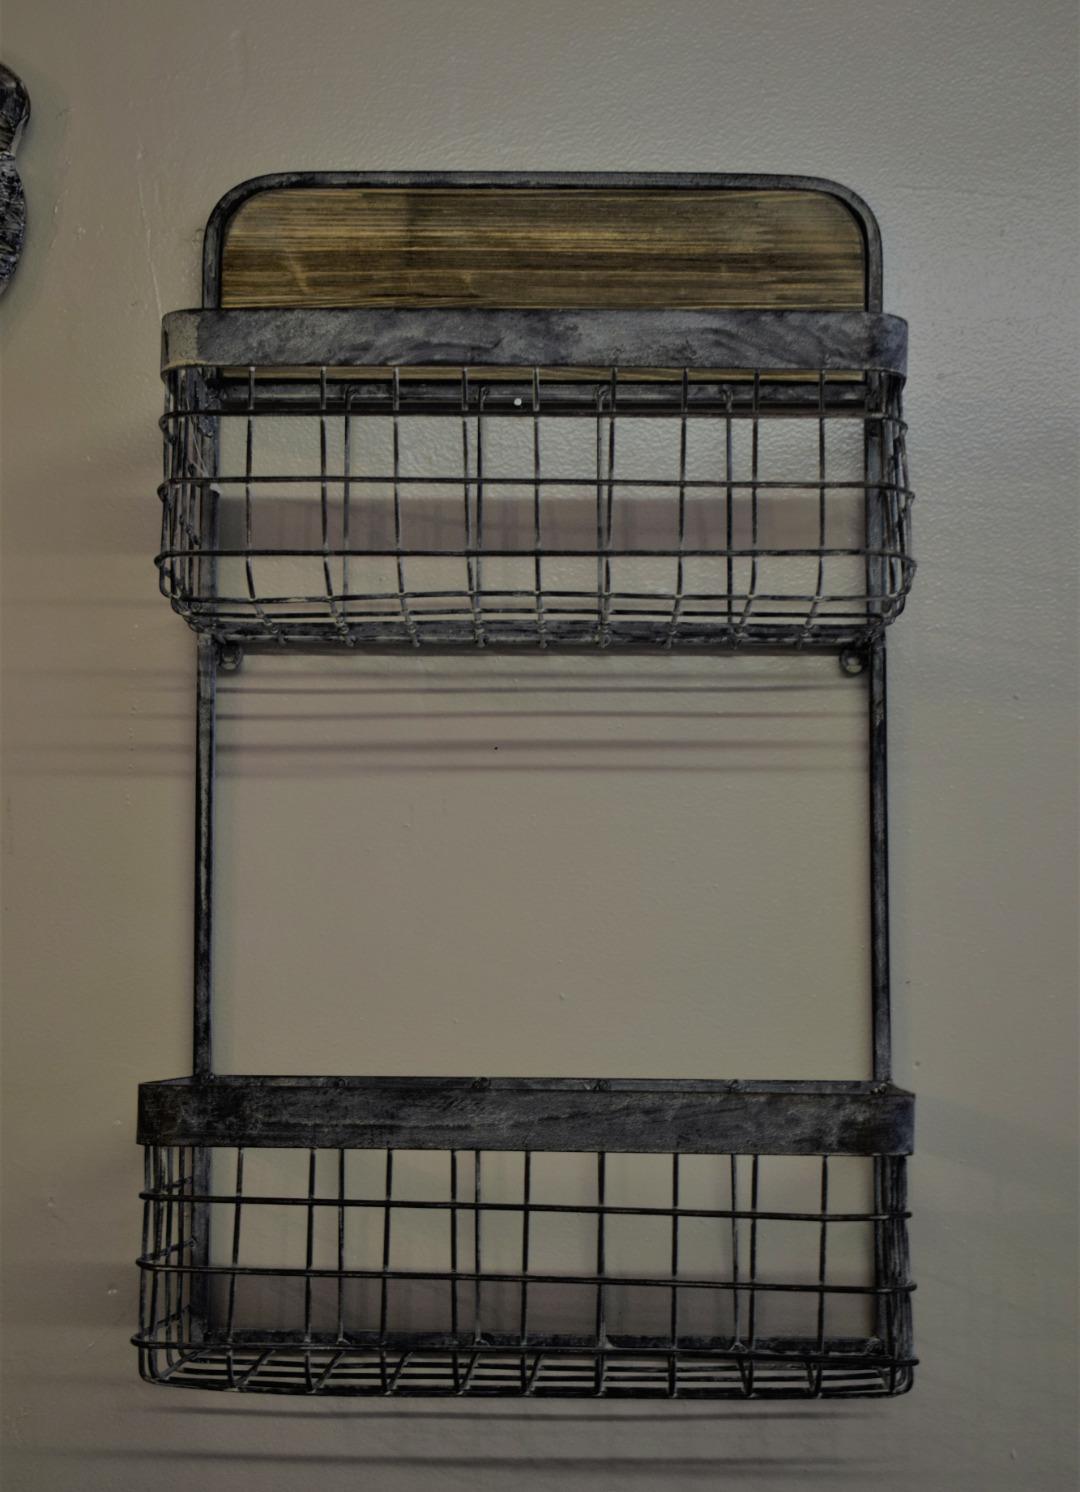 Industrial Metal Basket Wall Shelf Unit Wall Decor And Storage